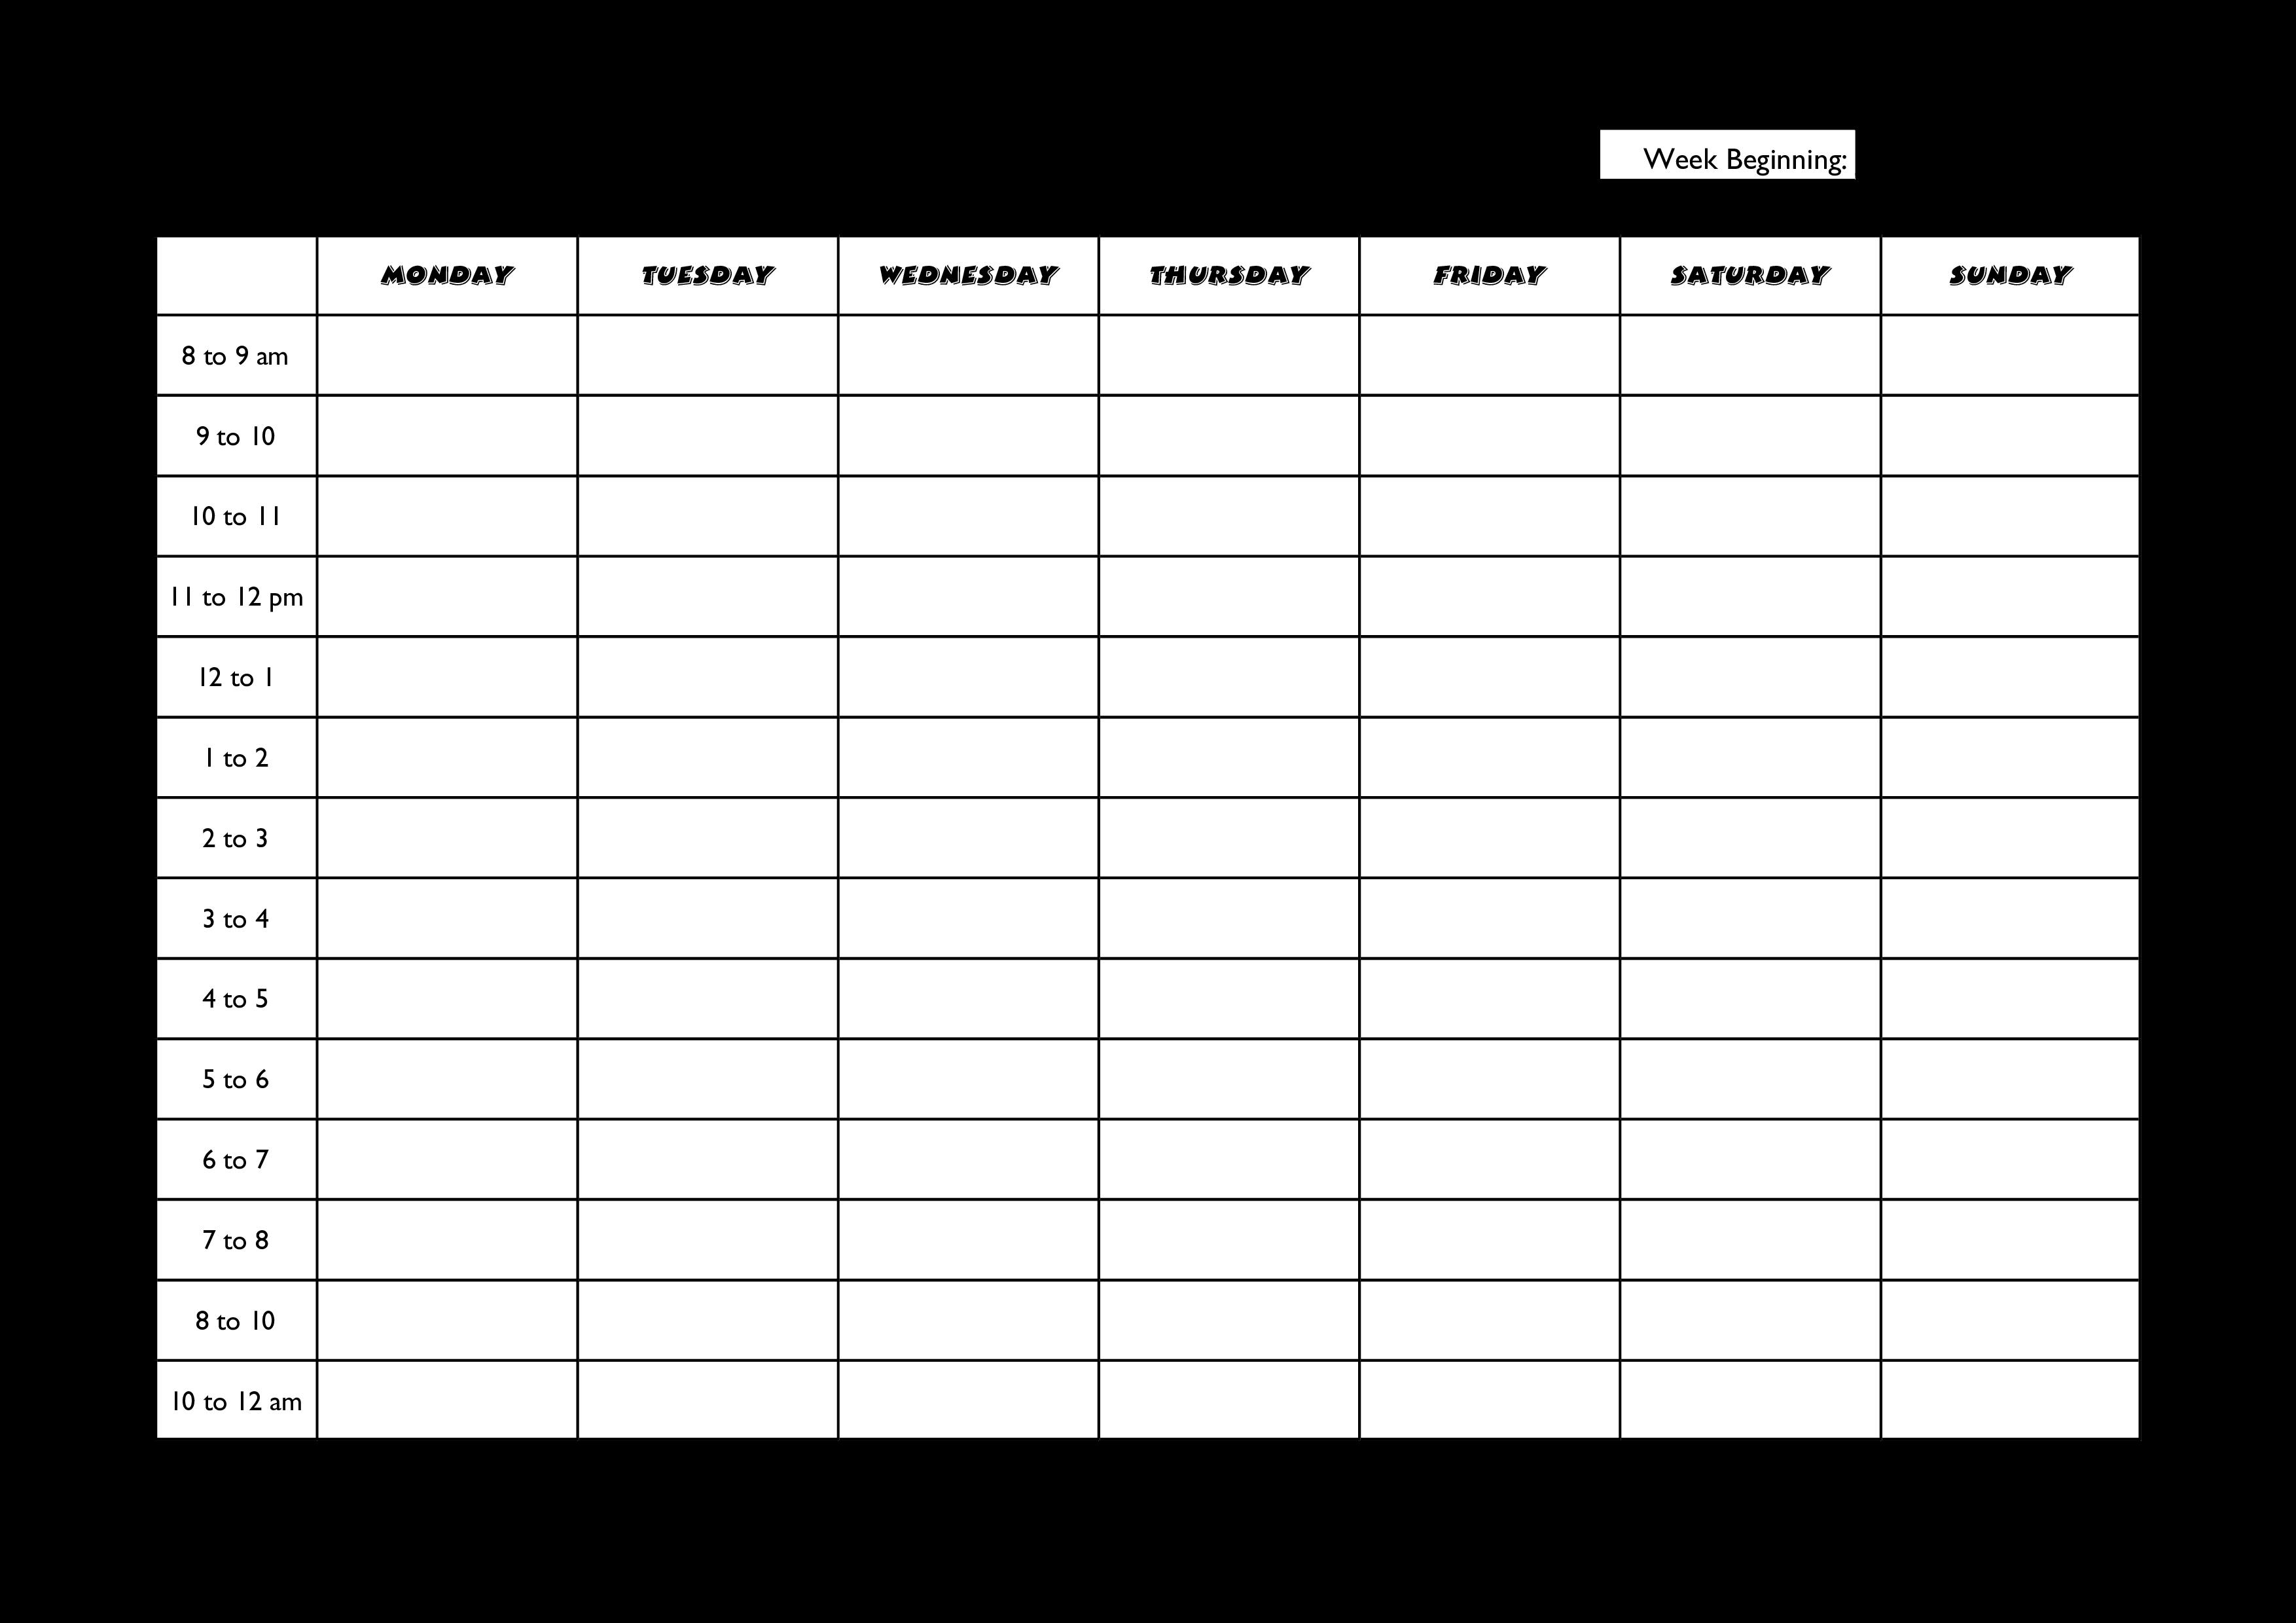 Free Weekly Activities Schedule | Templates at allbusinesstemplates.com